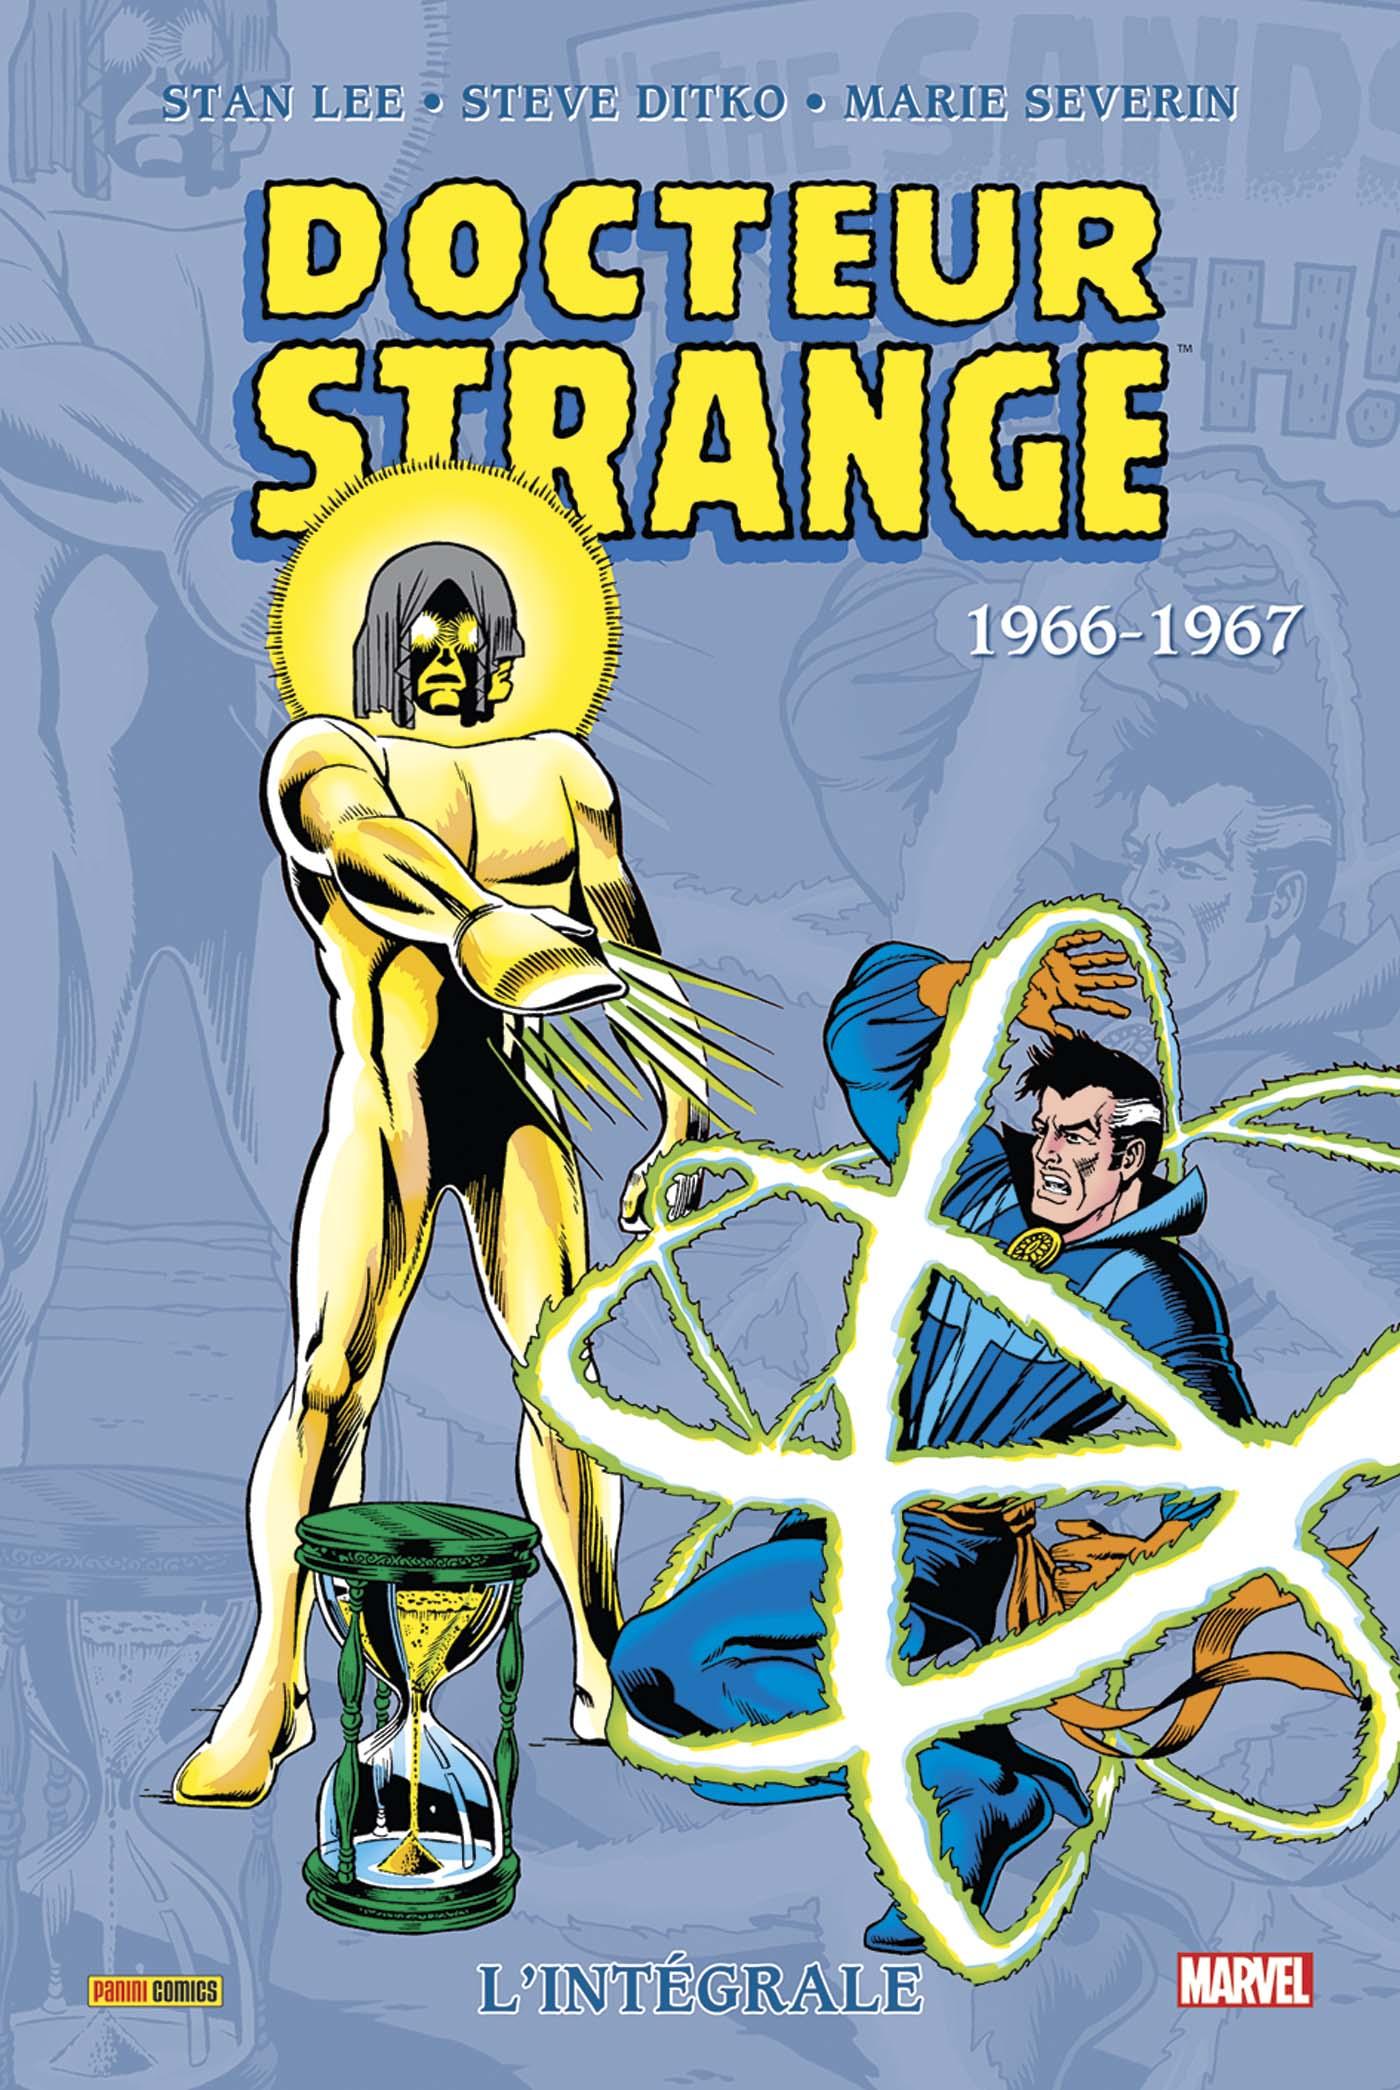 Docteur Strange 1966 - 1966-67